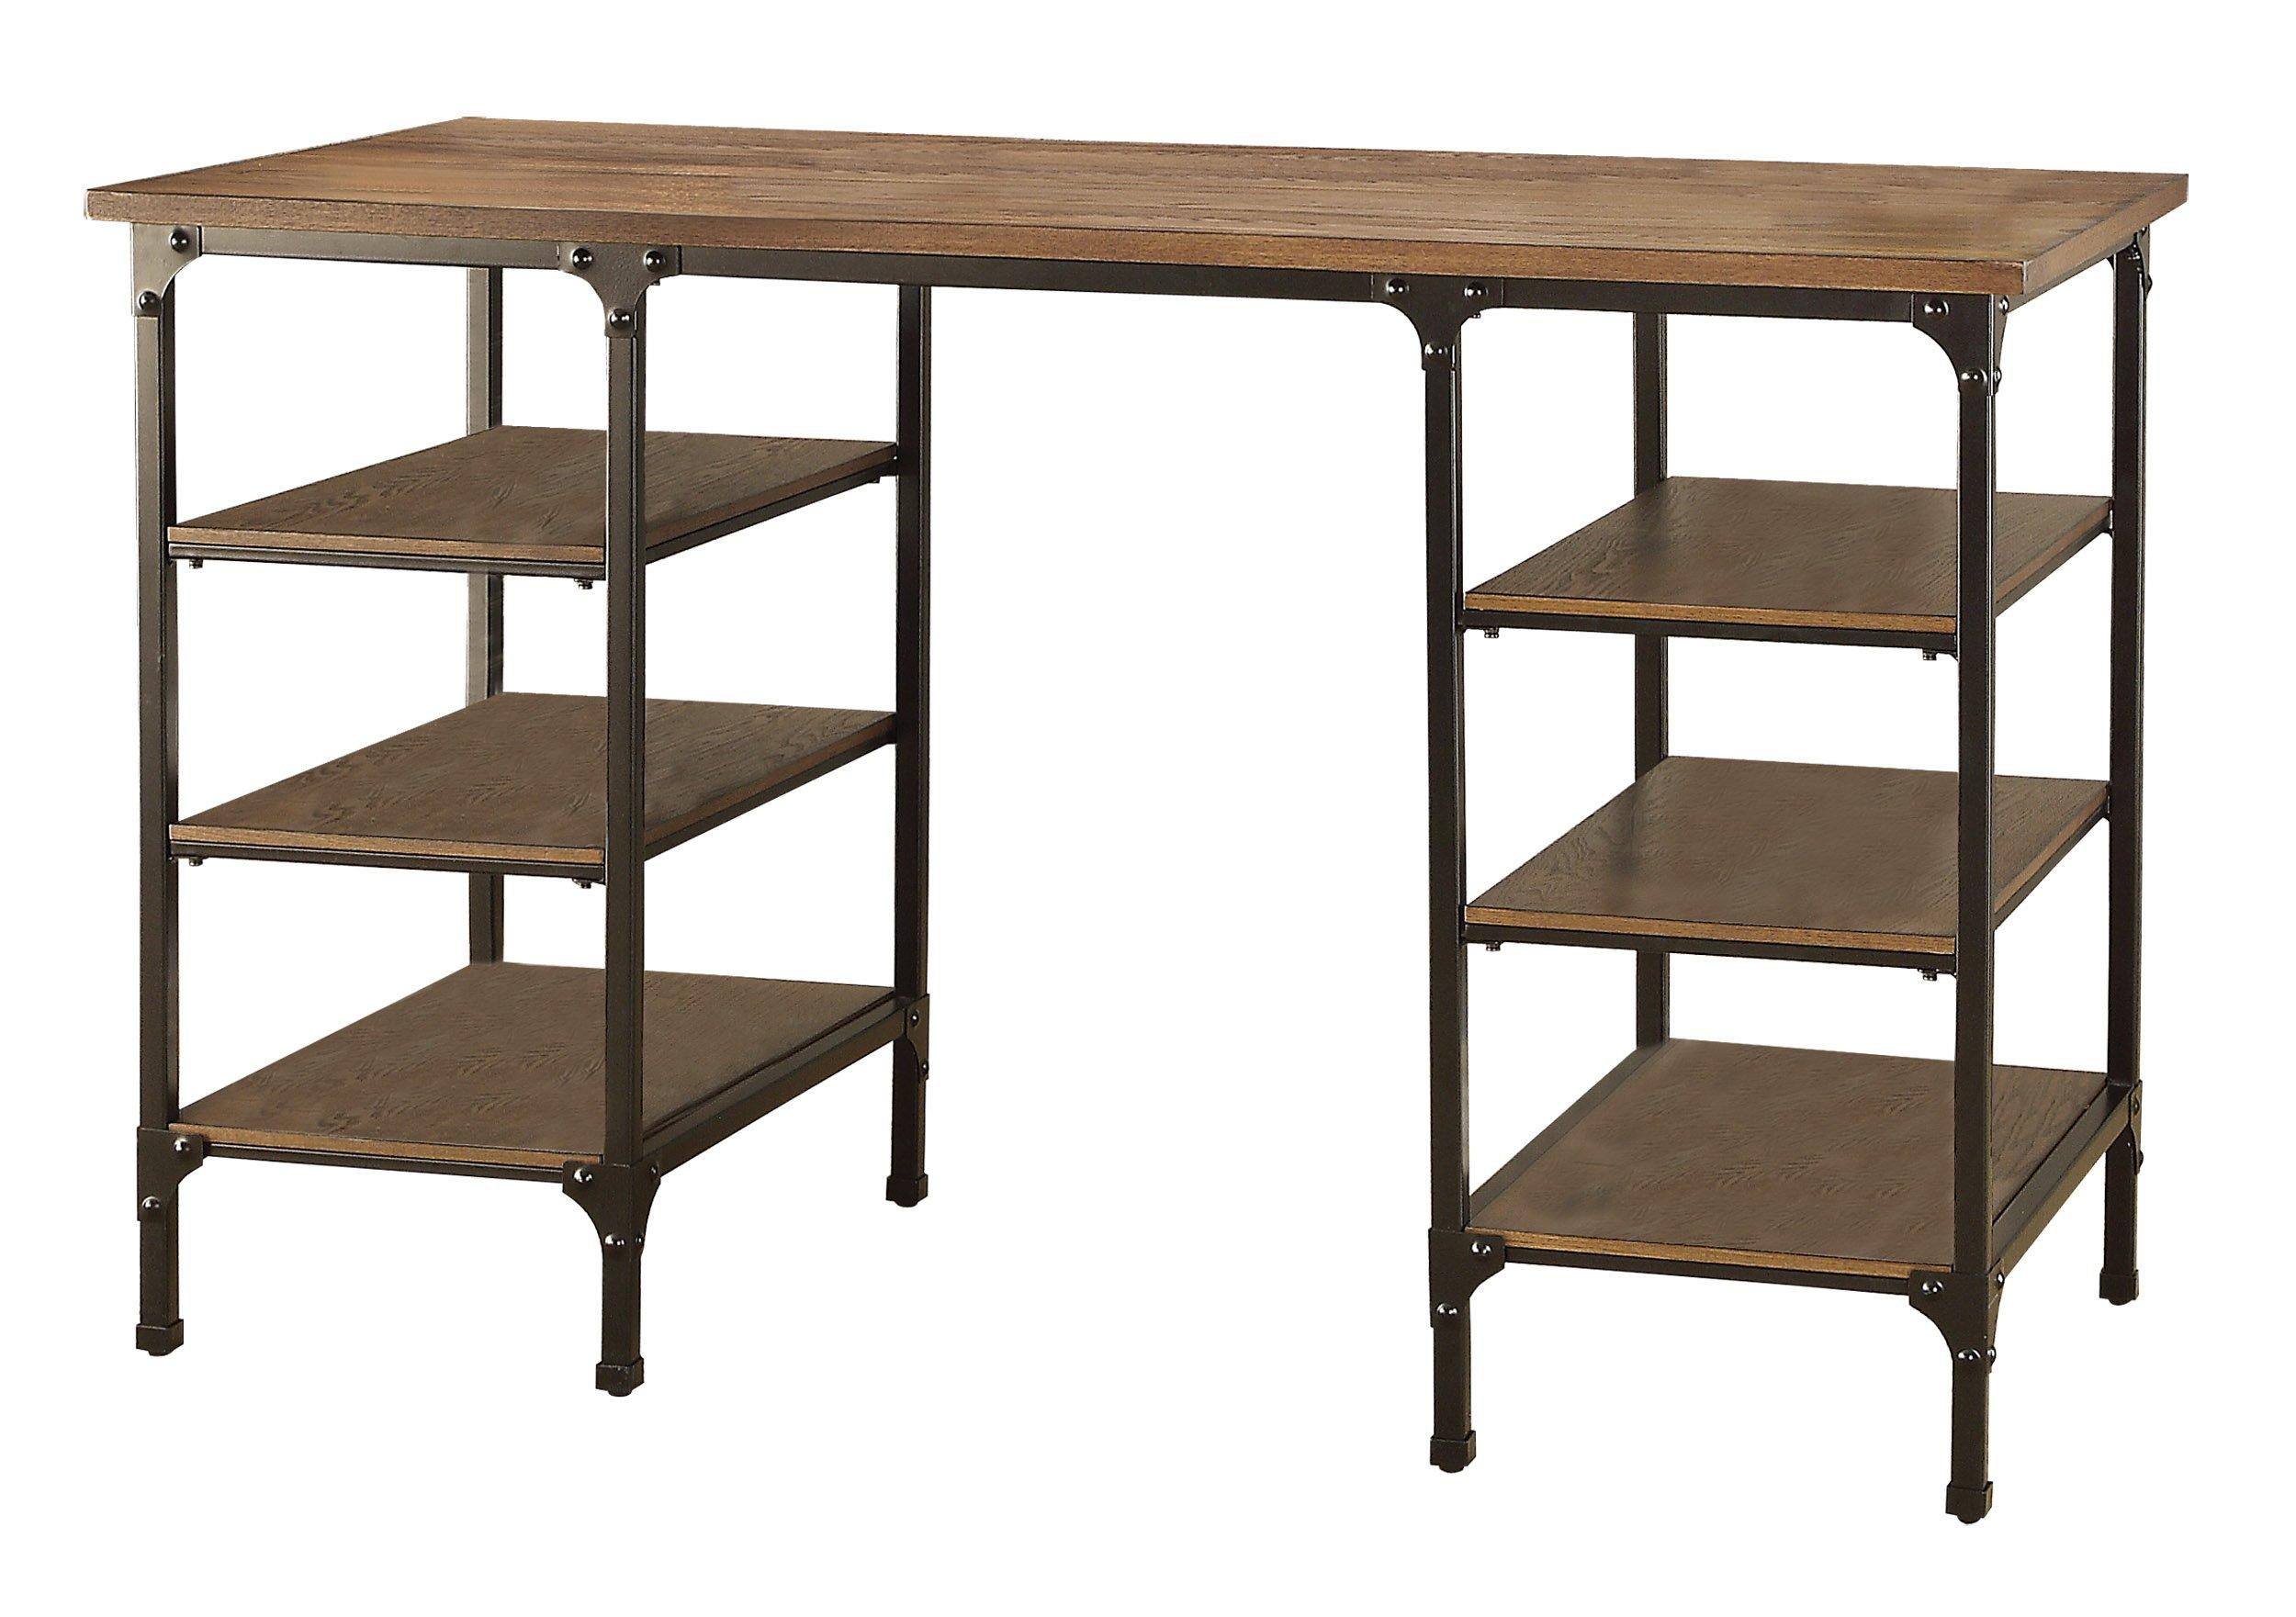 Homelegance Counter Height Metal Writing Desk with Open Shelves, Dark Oak Finish